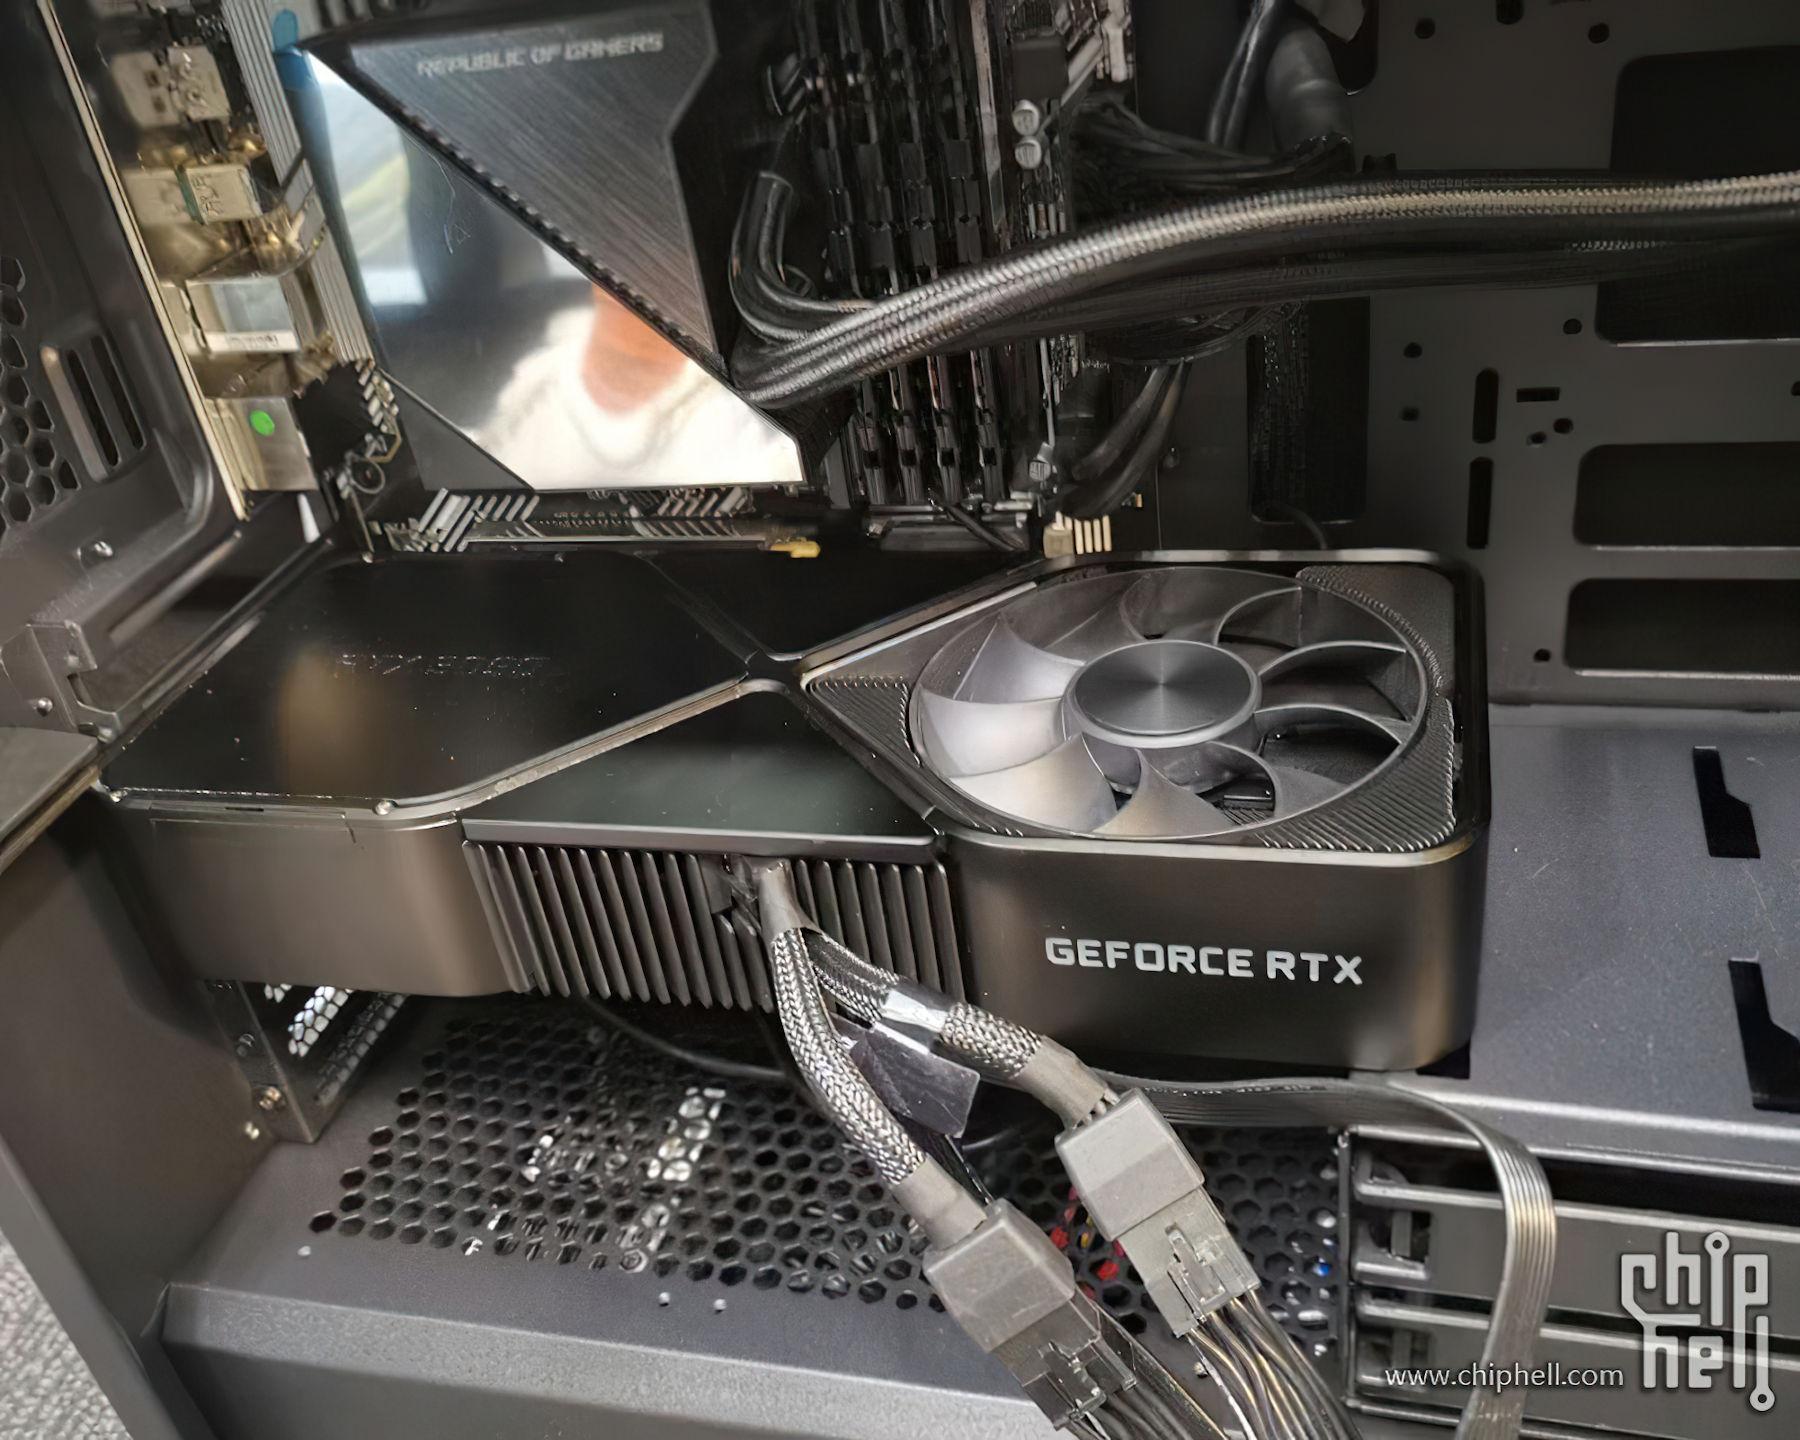 Nvidia Geforce Rtx 3090 In A Case Dans Un Boitier Pc